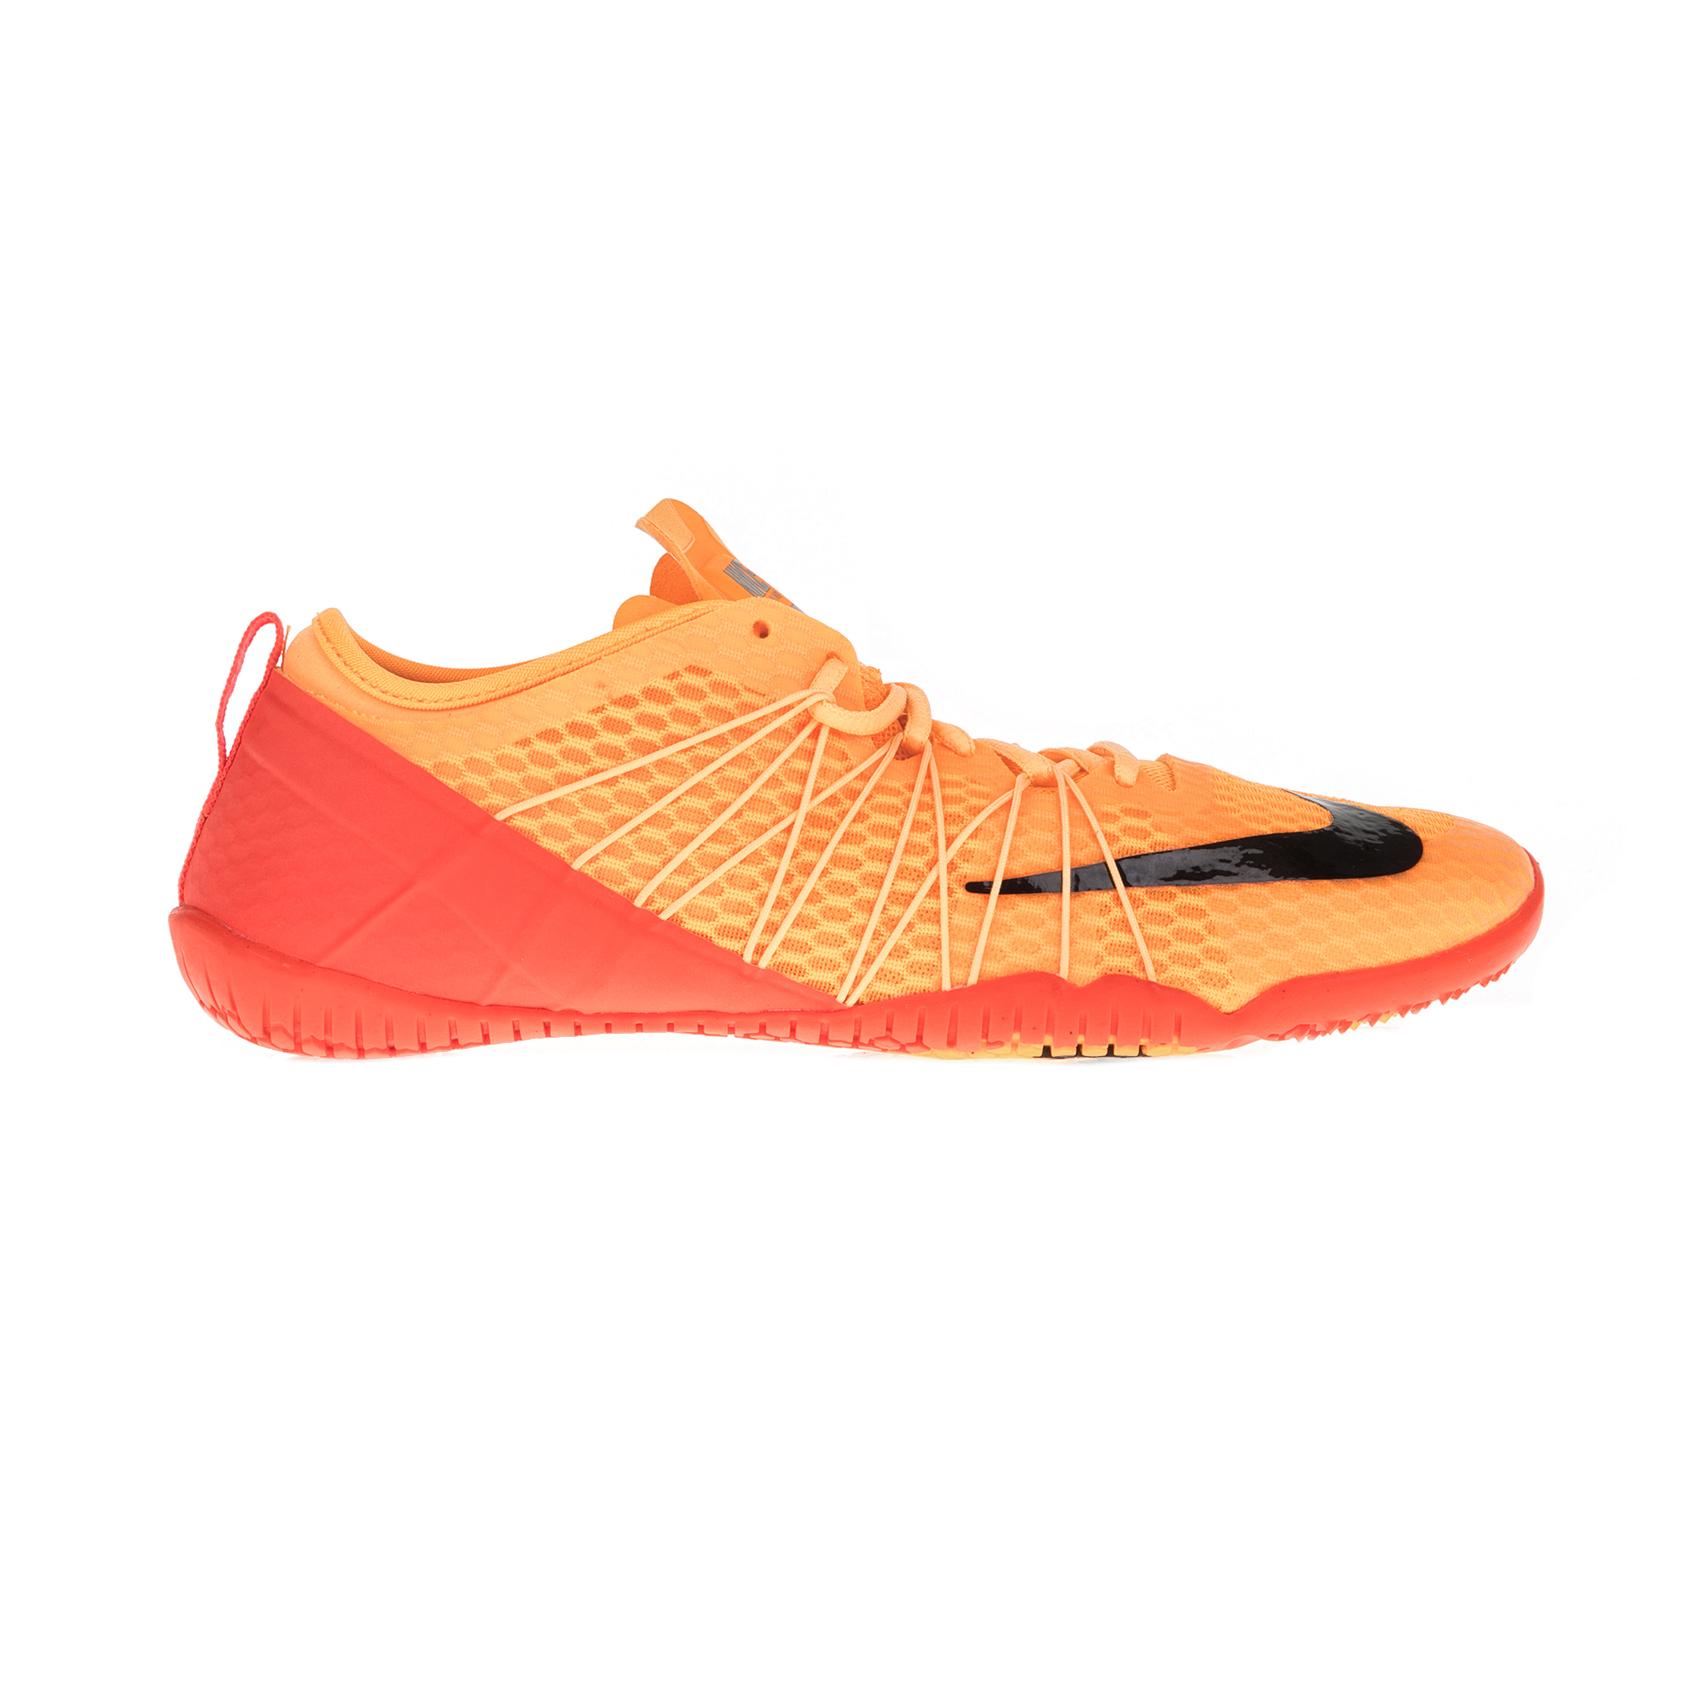 NIKE – Γυναικεία παπούτσια FREE 1.0 CROSS BIONIC 2 πορτοκαλί